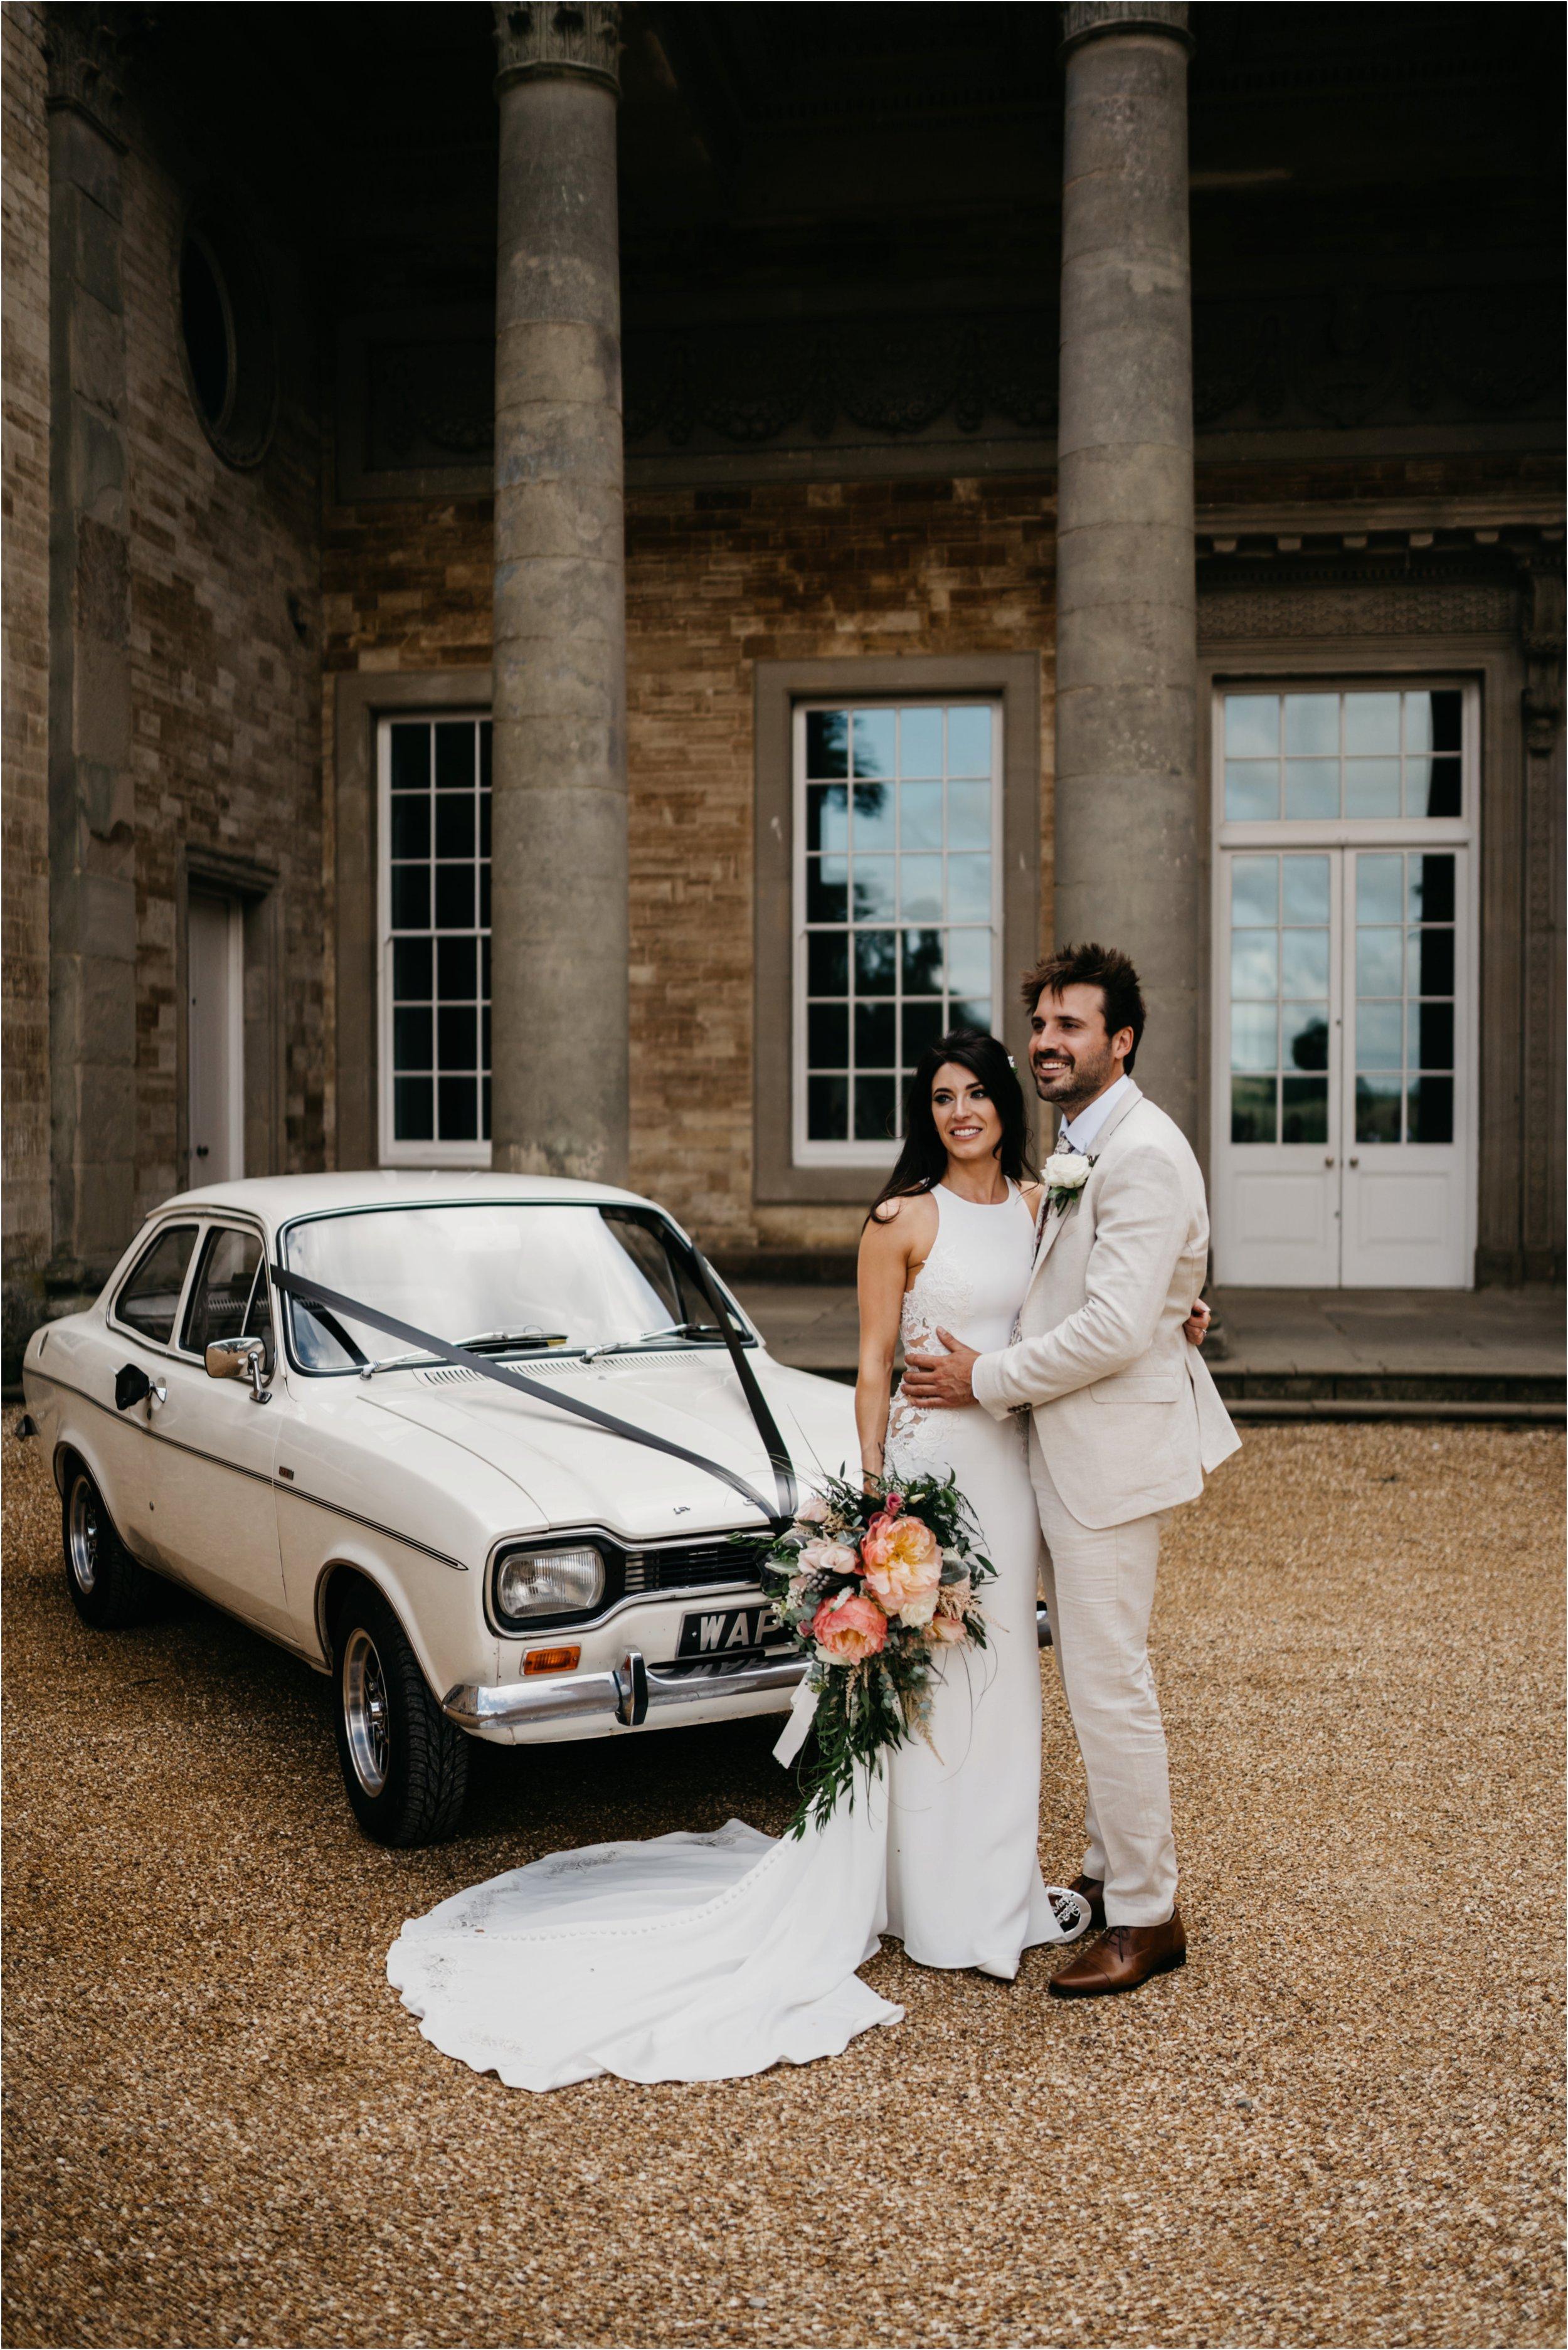 Compton Verney wedding photography_0085.jpg